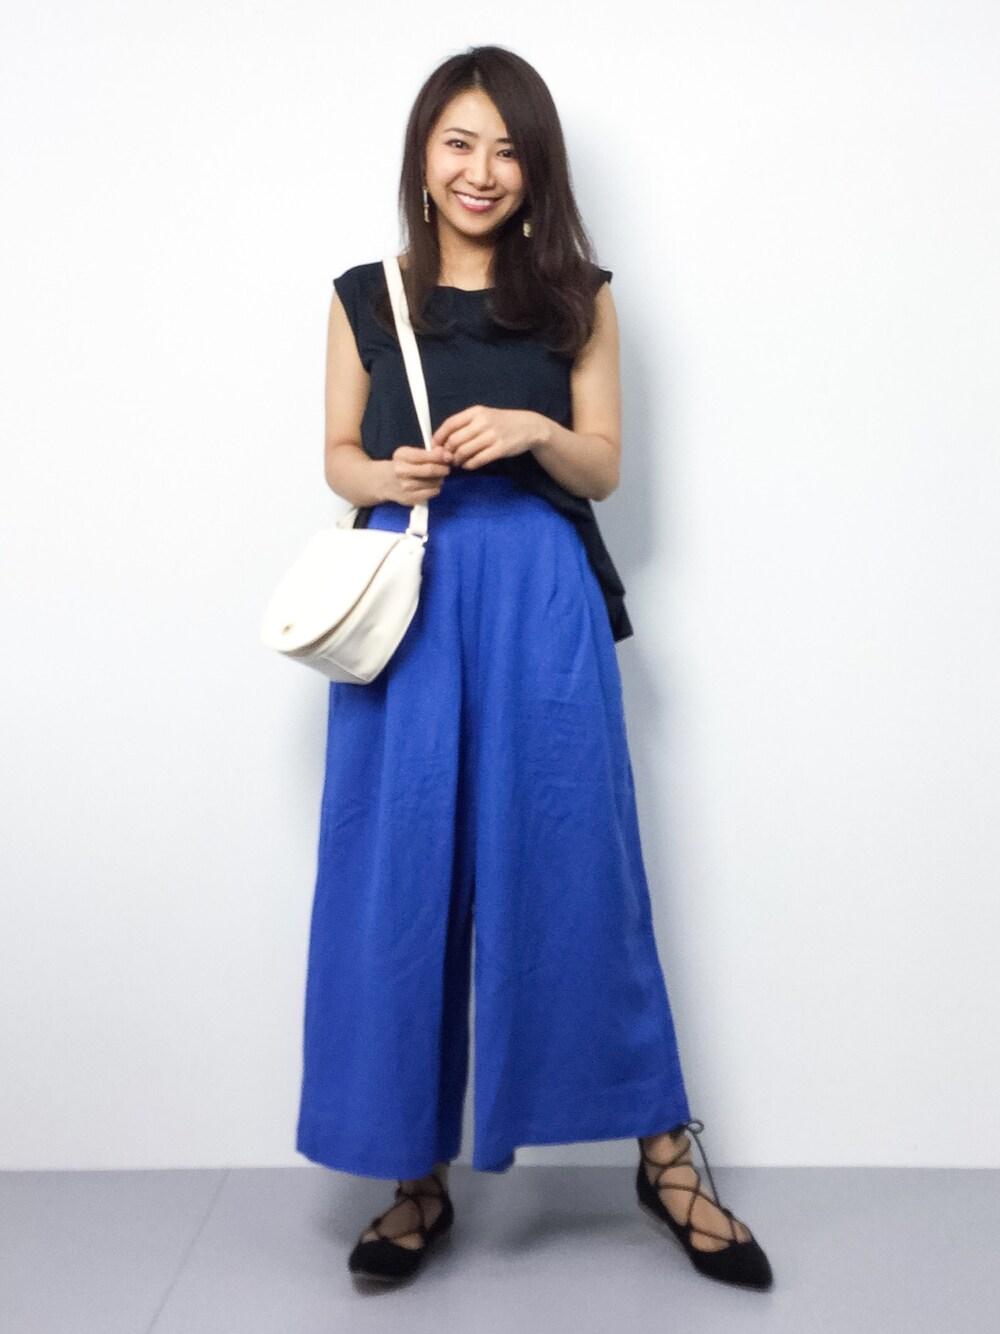 出典:http://wear.jp/wear10070/7447506/